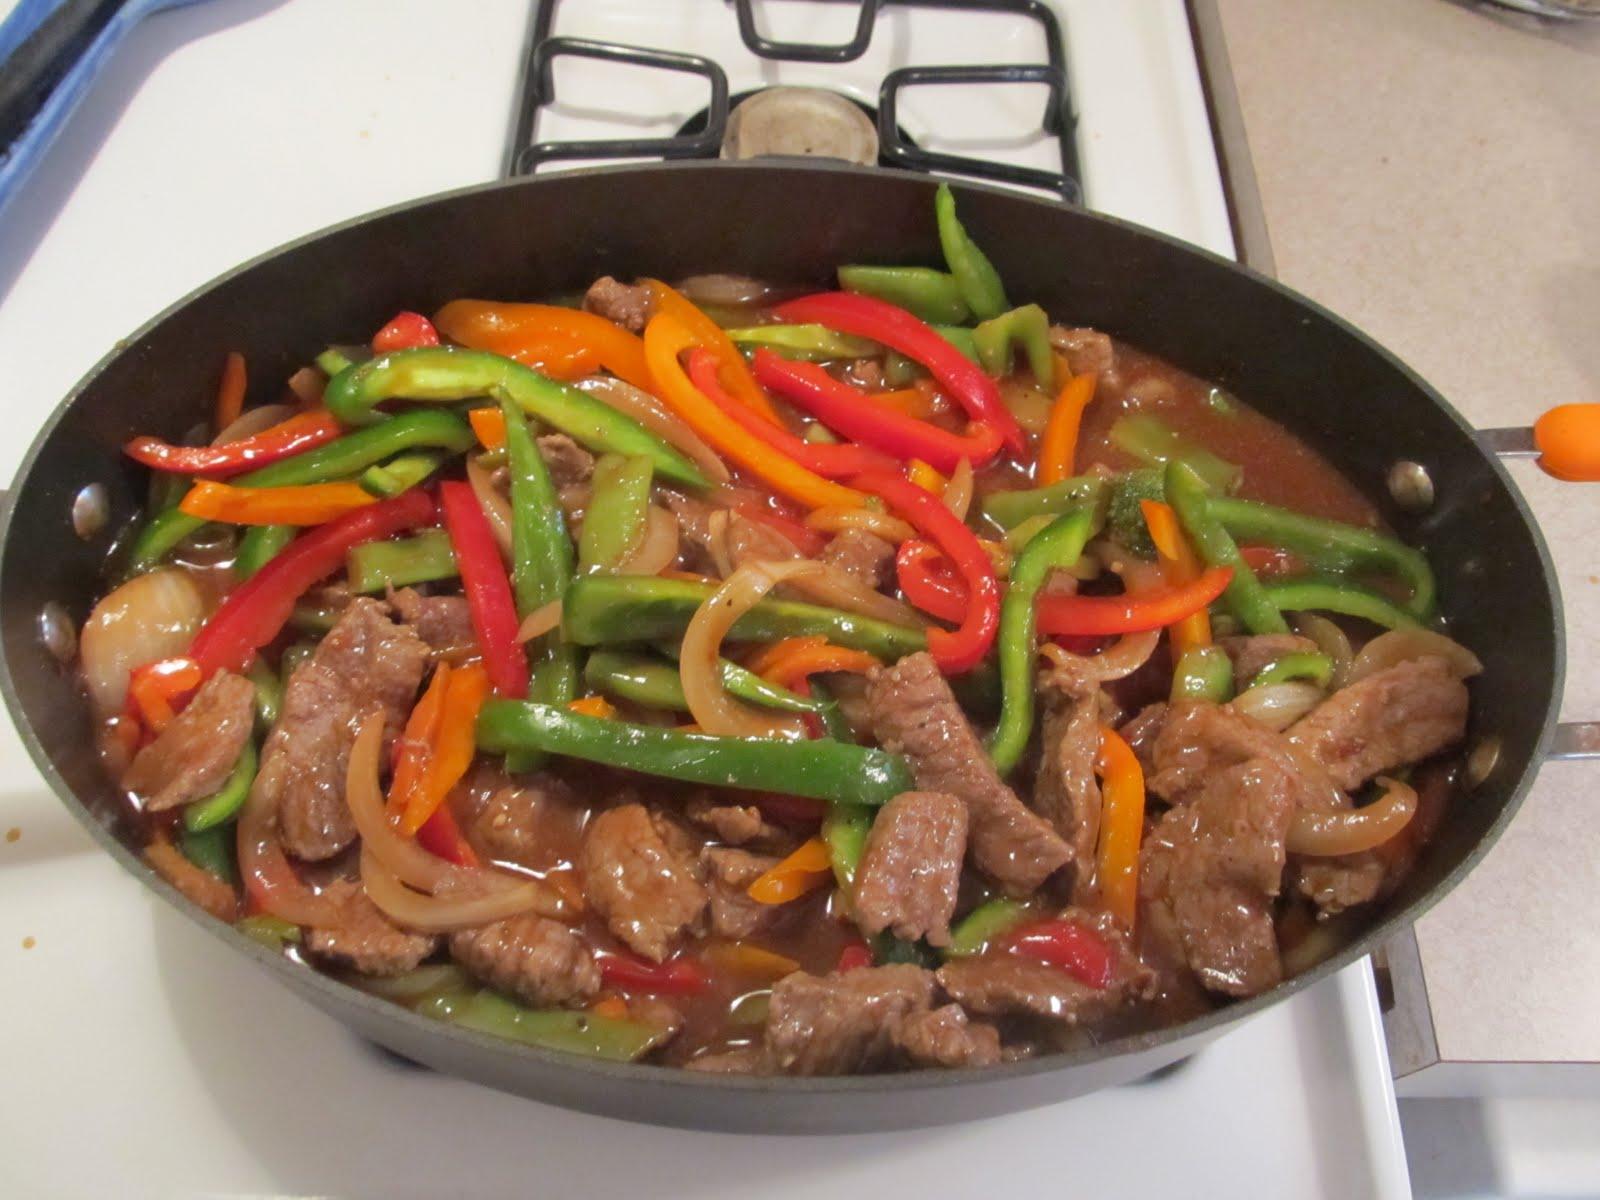 Keeza's Freezer Meals: Pepper Steak